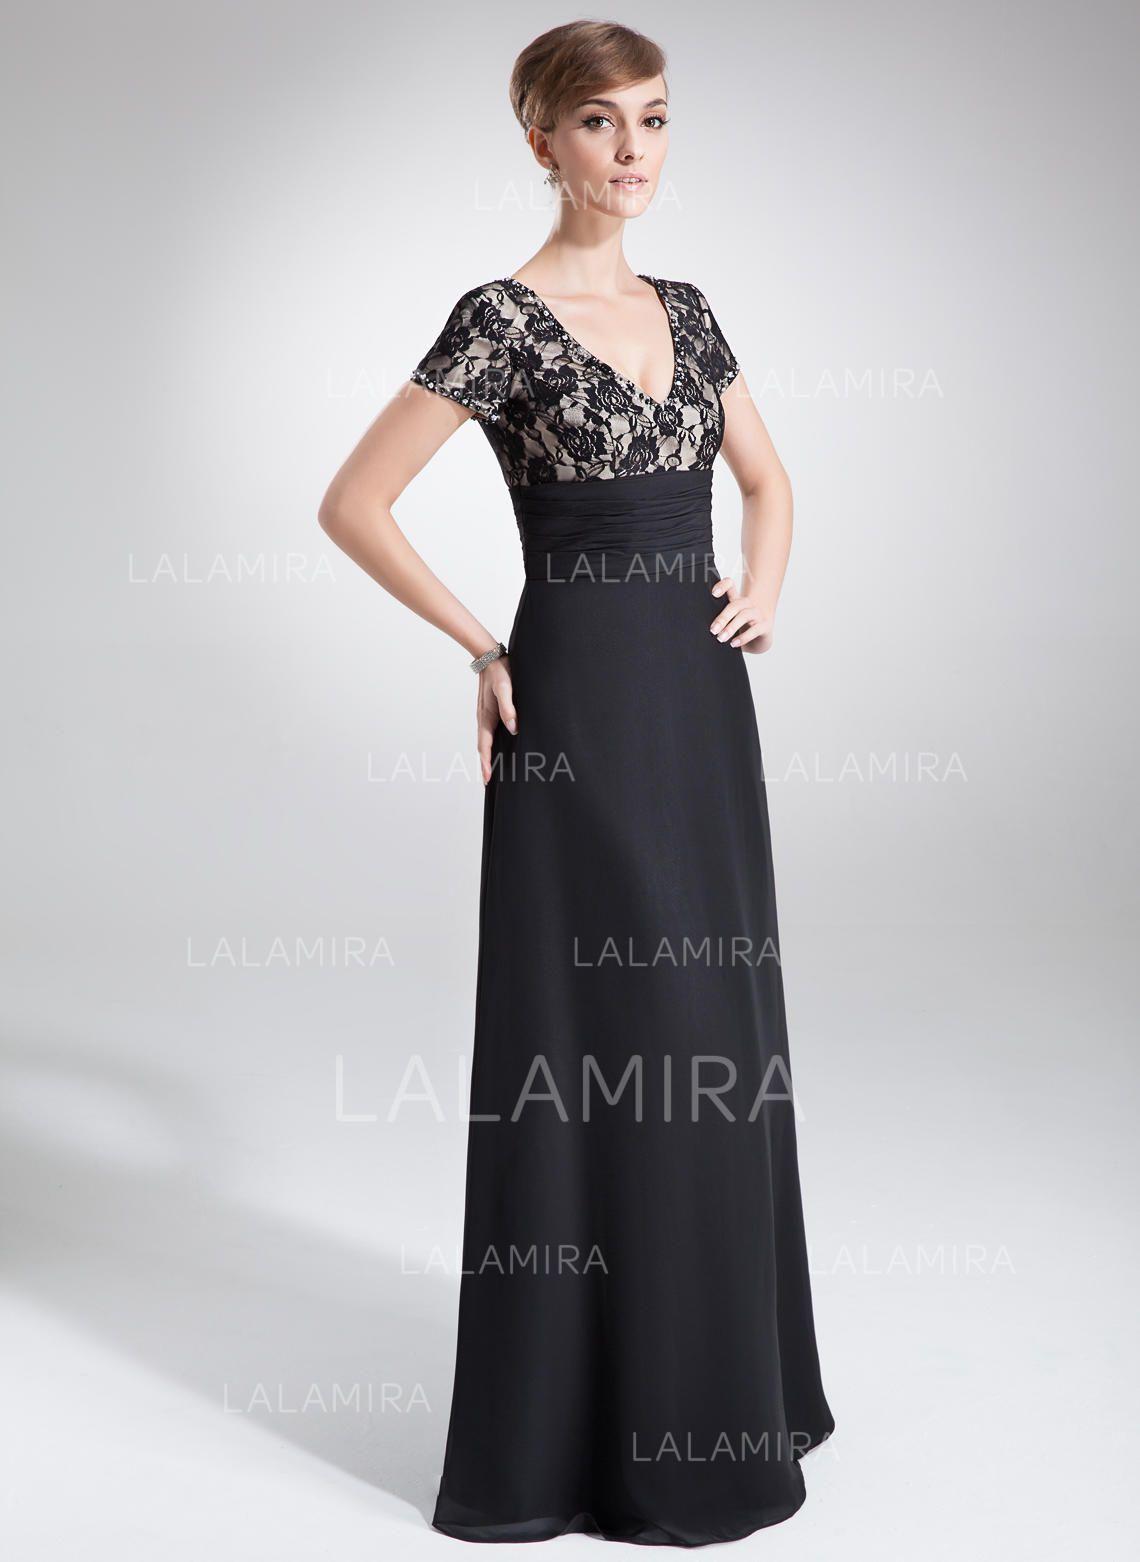 099d83a3a4e A-Line Princess V-neck Floor-Length Chiffon Lace Mother of the Bride  Dresses With Ruffle Beading (008005673) - Mother of the Bride Dresses  5673  - lalamira